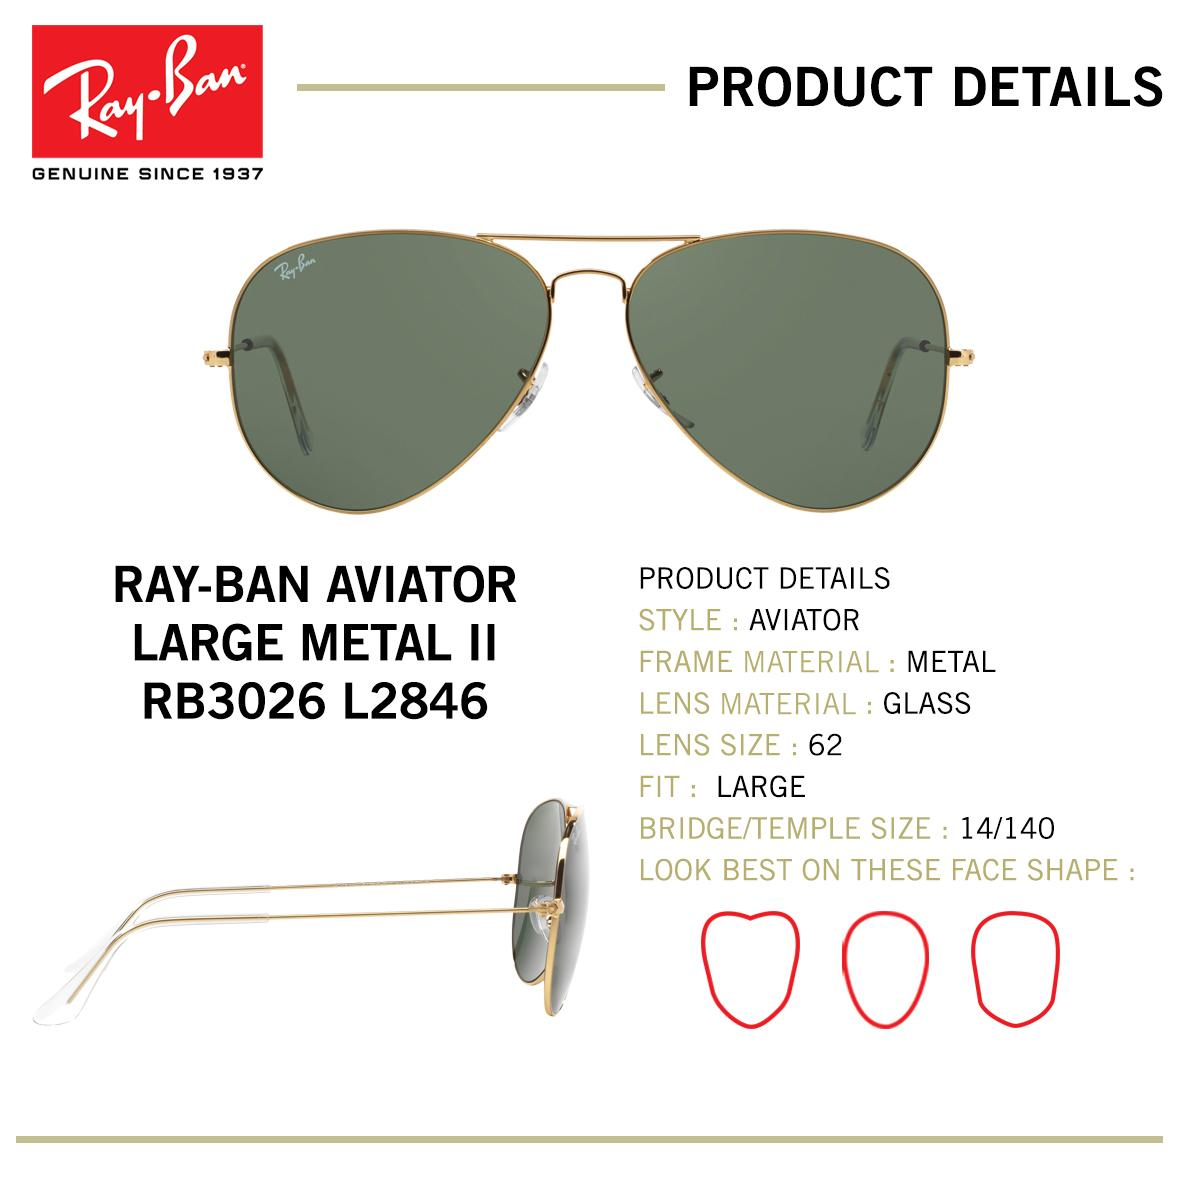 07f1f5cb25 Ray-Ban Aviator Large Metal Ii - RB3026 L2846 - size 62